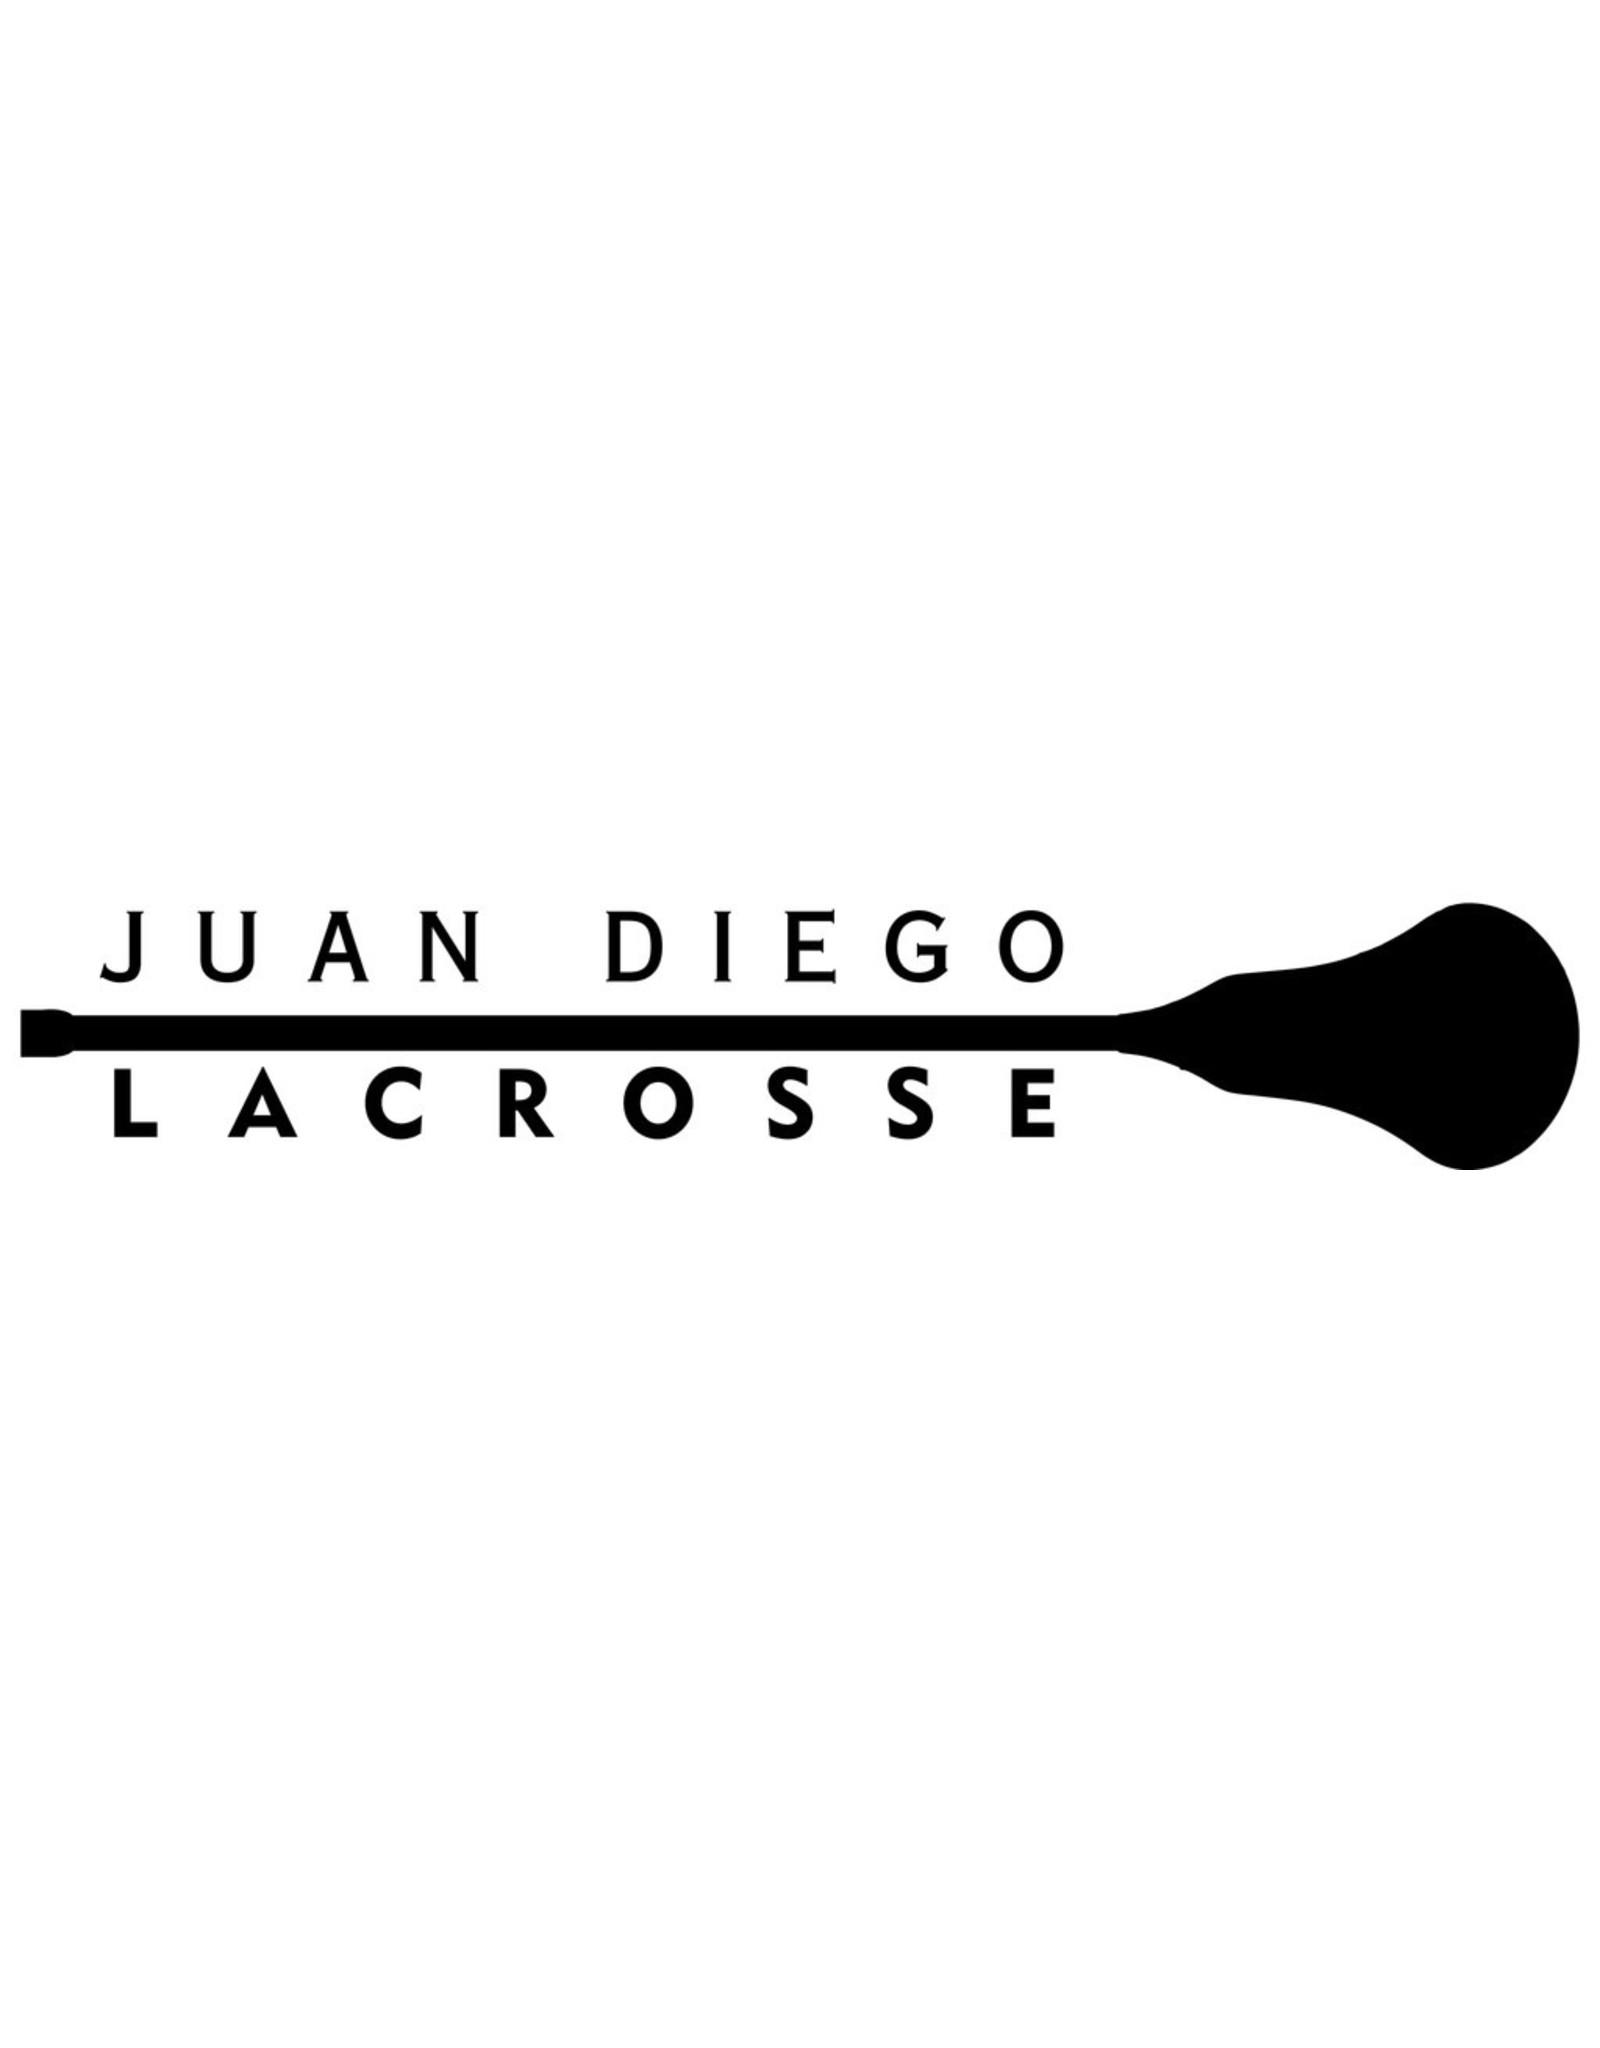 NON-UNIFORM Juan Diego Lacrosse Decal, white